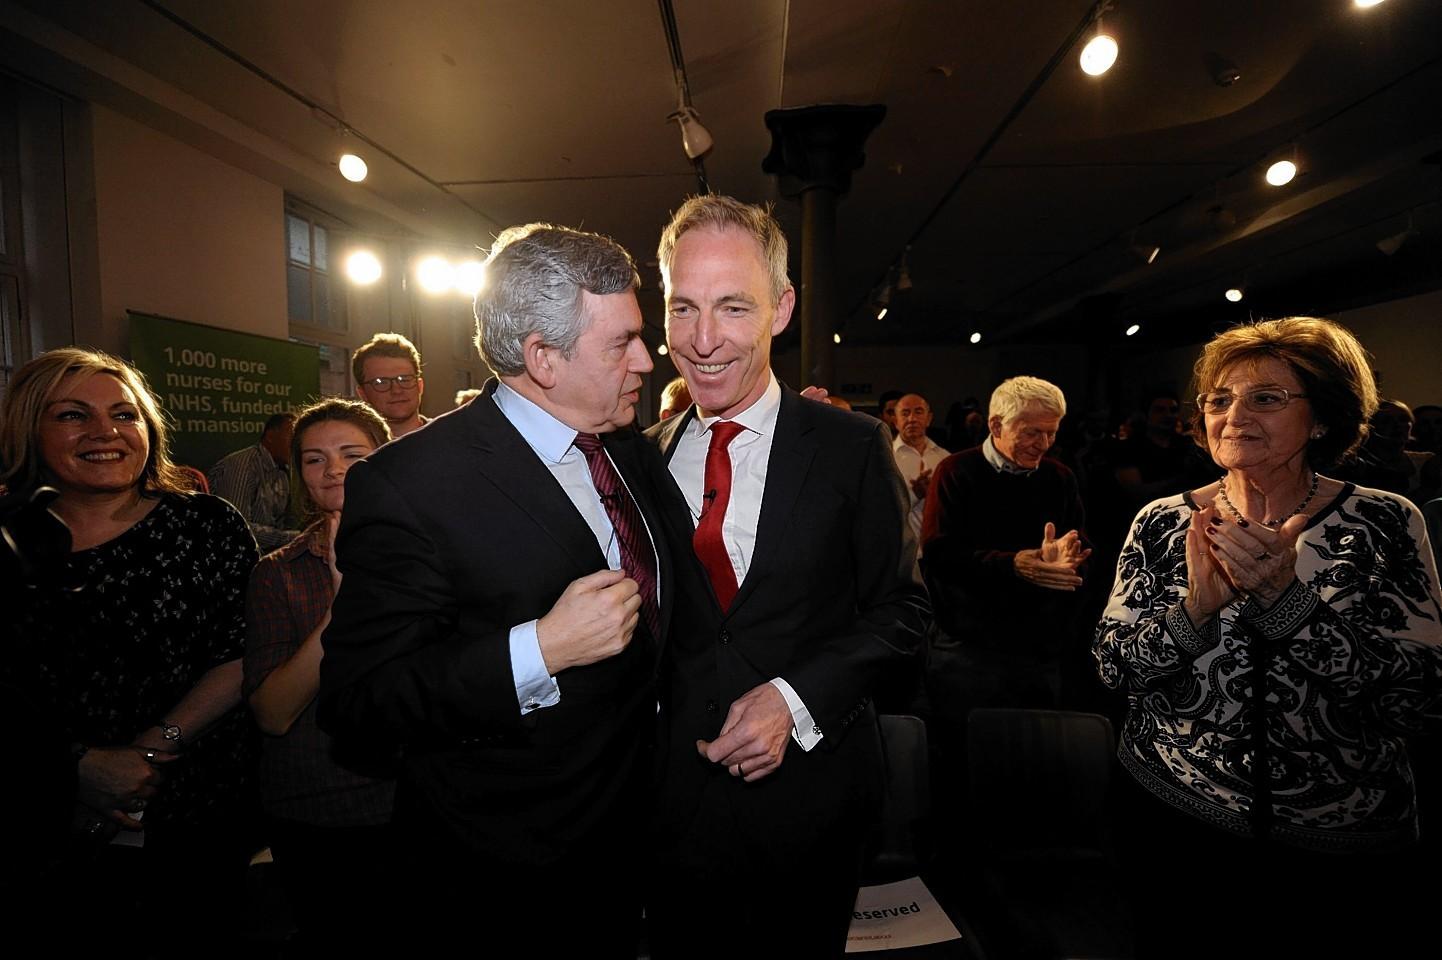 Former Labour leader Gordon Brown and Scottish Labour leader Jim Murphy